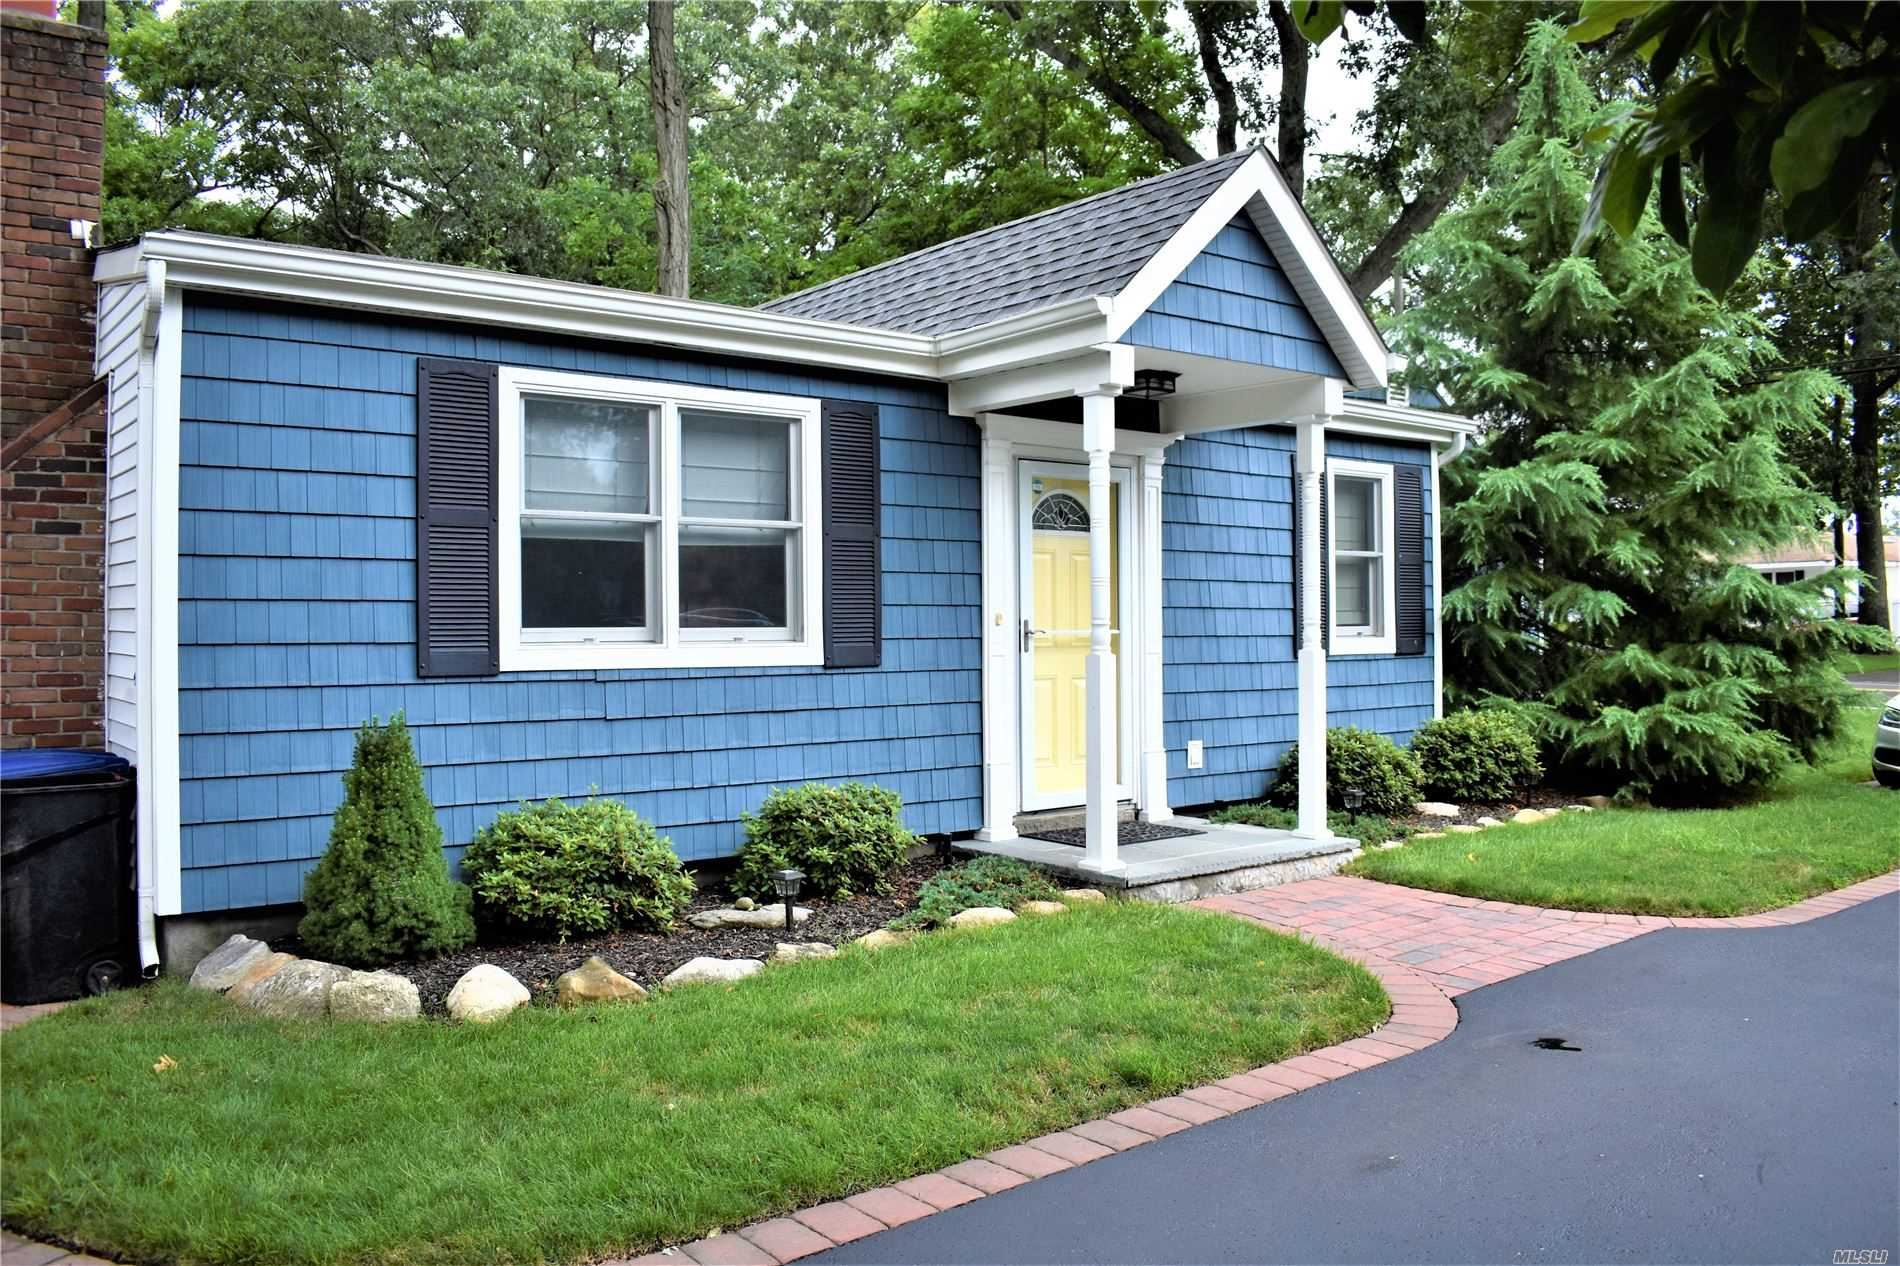 78 N Evergreen Dr, Selden, NY 11784 - MLS#: 3240164